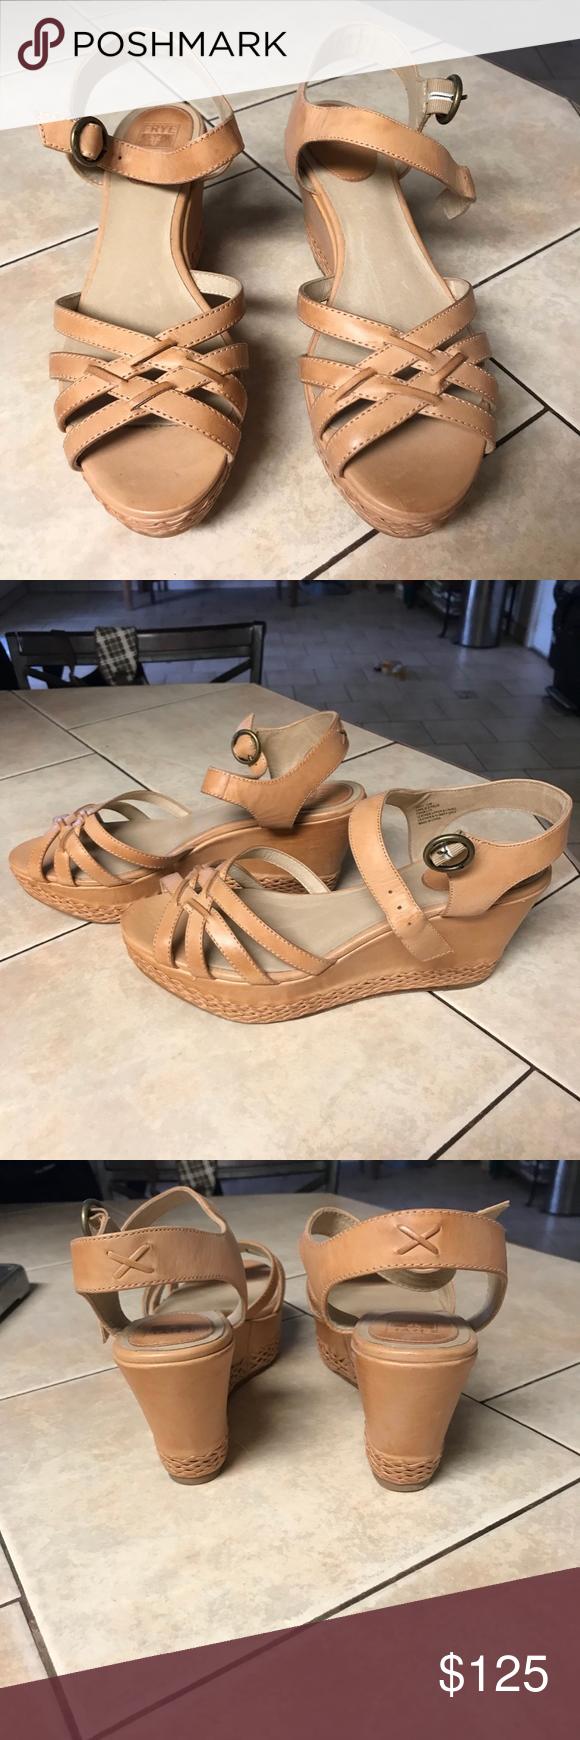 66fc9897b28 FRYE WOMEN S CARLIE WEDGE SANDAL LEATHER Frye  Carlie 2 Piece  Woven Leather  Wedge Sandal